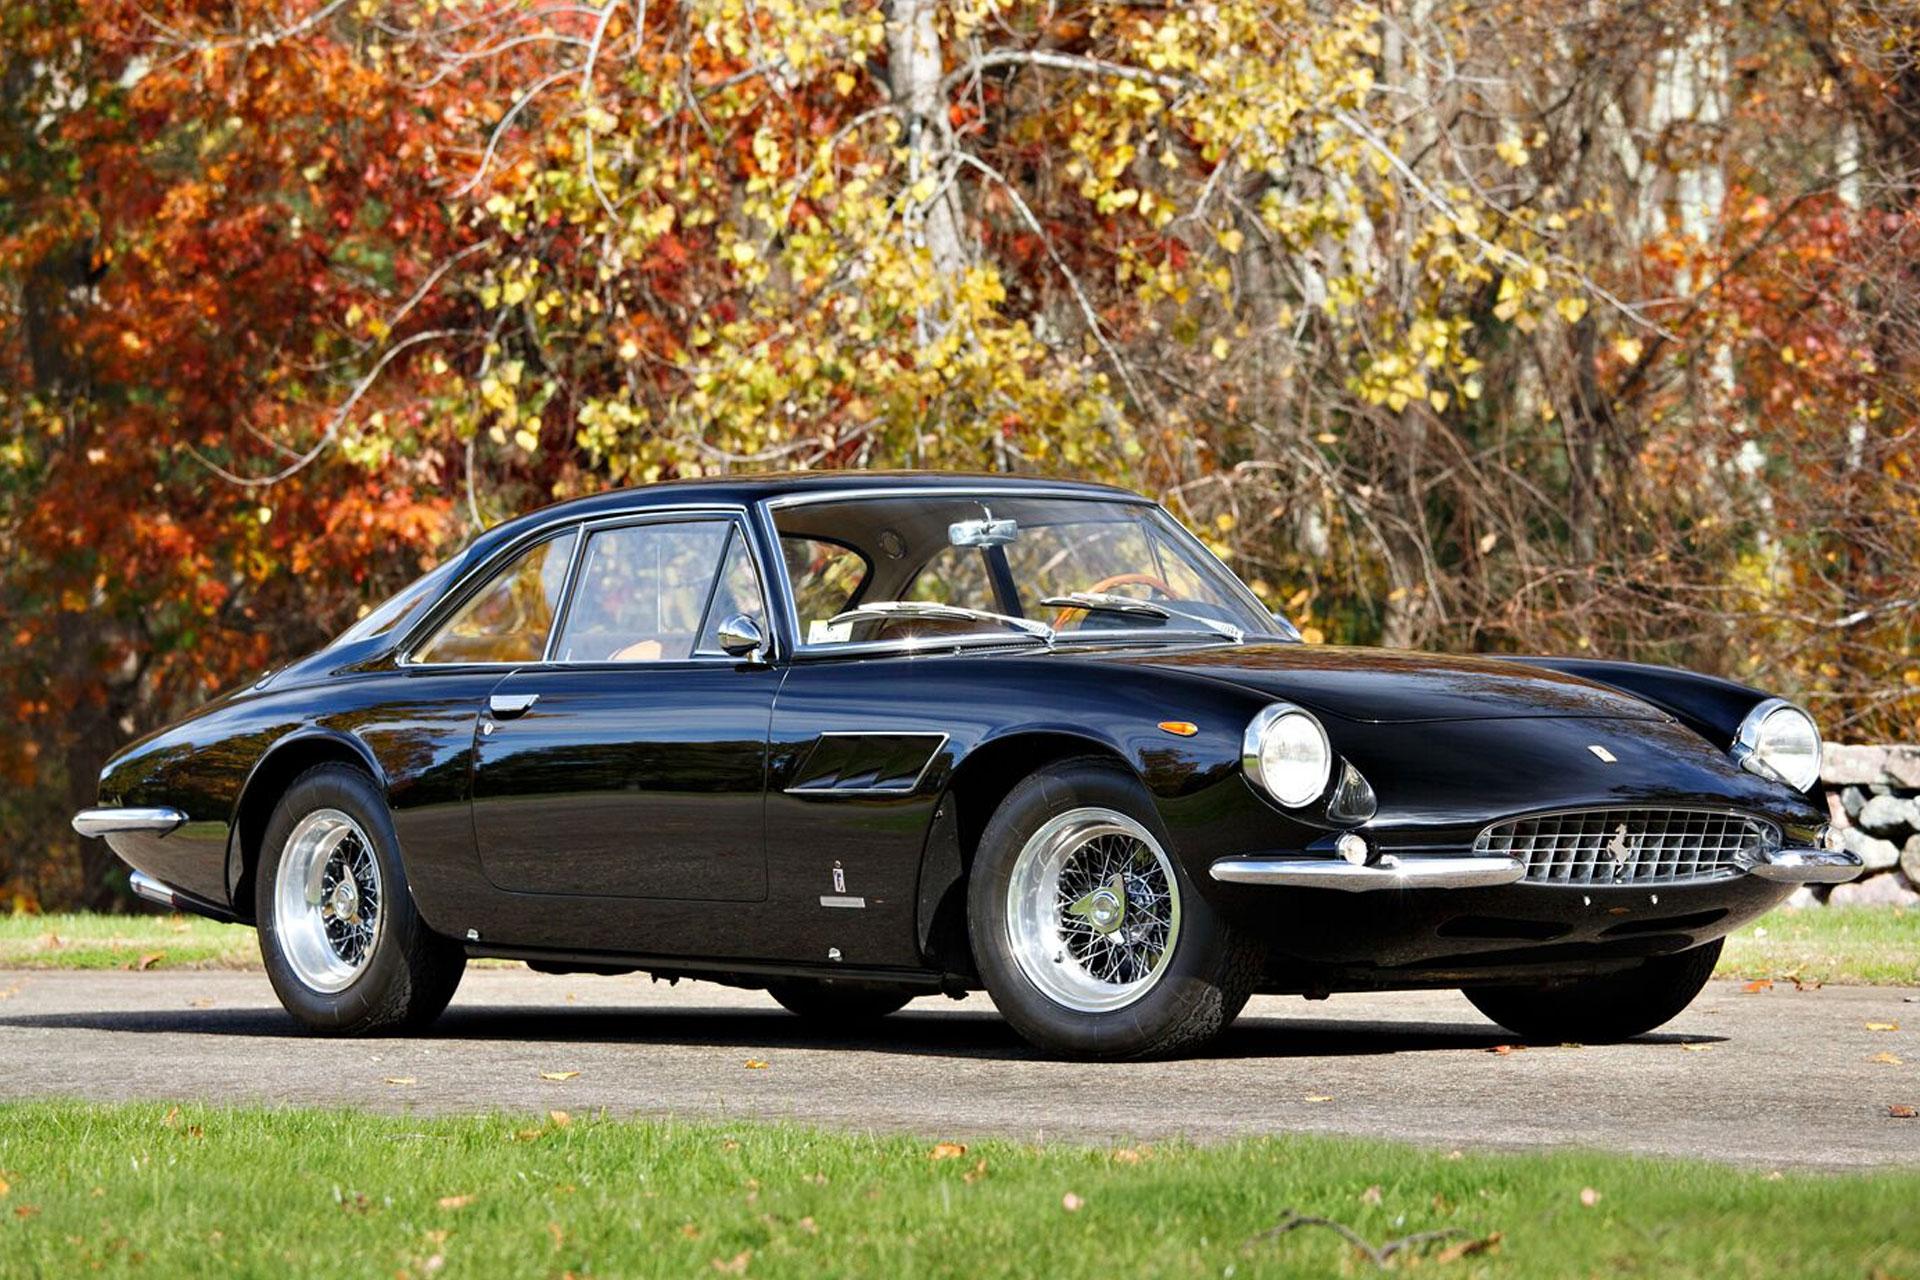 1965 Ferrari 500 Superfast Coupe